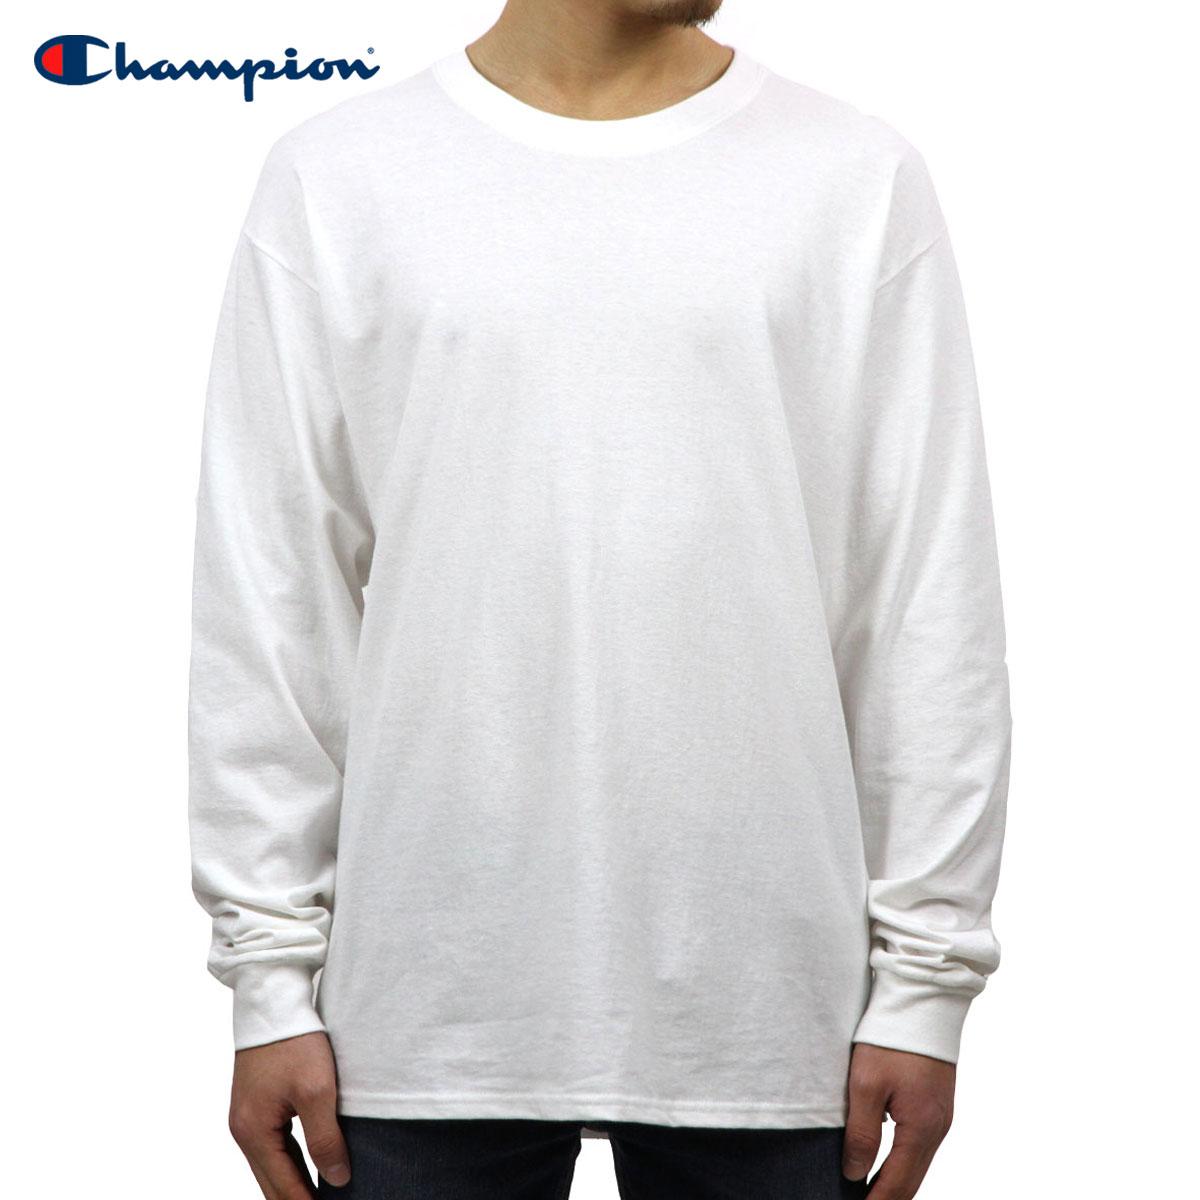 Rakuten Ichiba shop MIXON  Champion CHAMPION Eagle men s long-sleeved T  shirt l s TEE T2229 Cotton Long Sleeve Tee 045-WHITE C logo on left sleeve   590df246da0